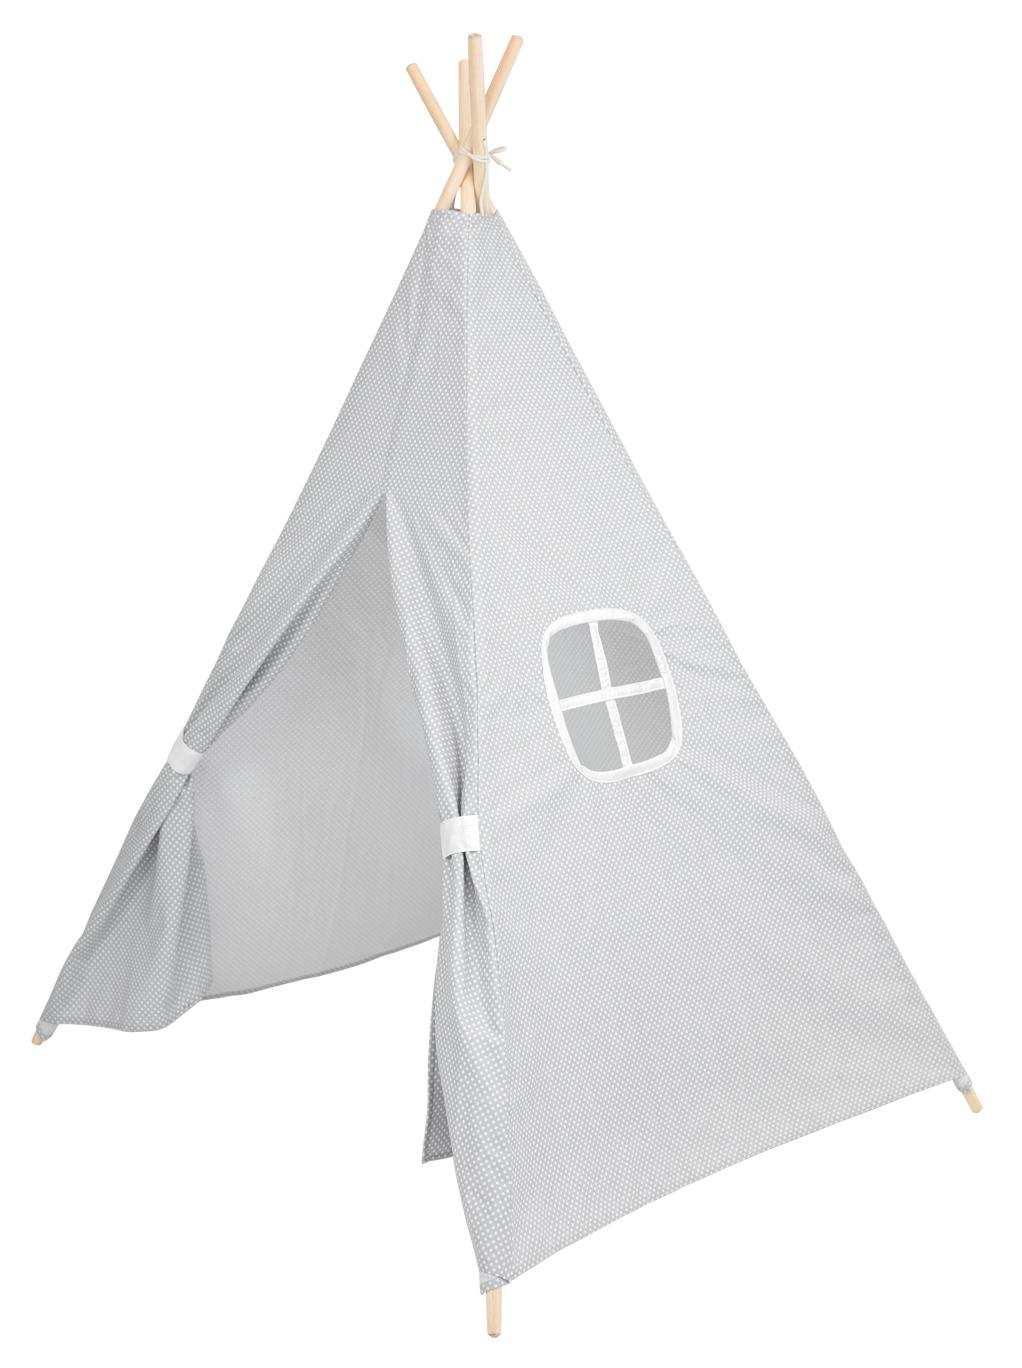 Spielzelt Tipi Zelt aus Stoff grau